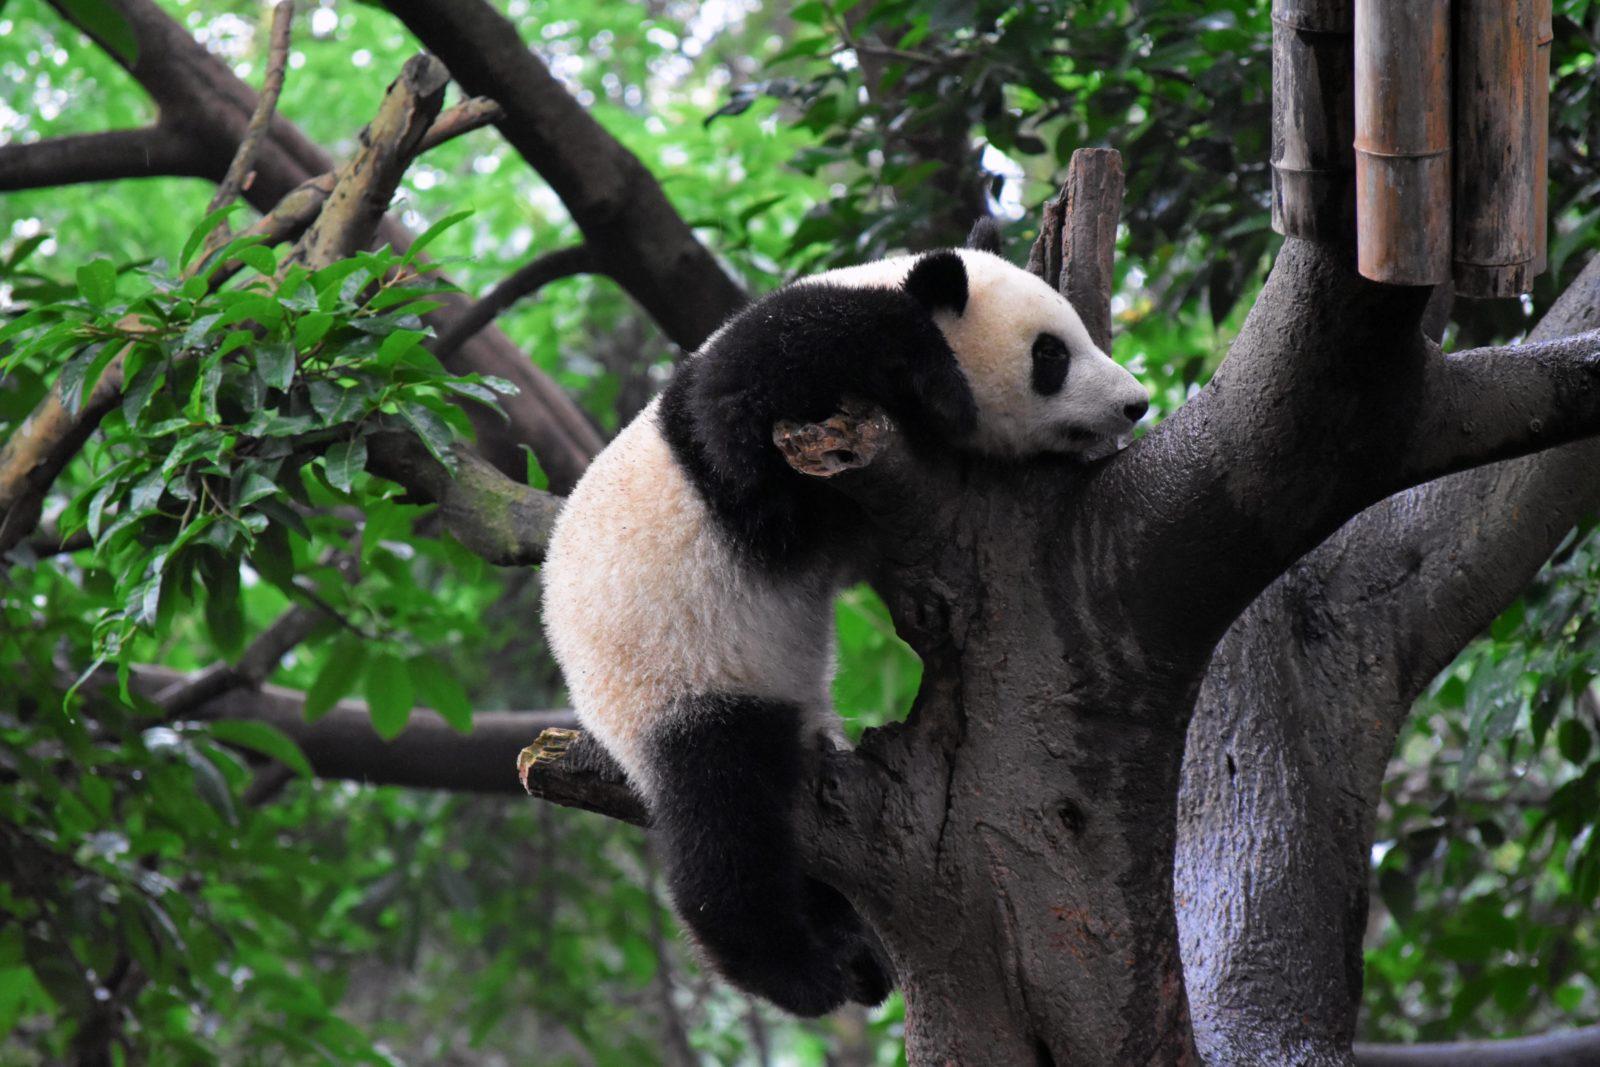 A panda climbing a tree in the Hendu province of China